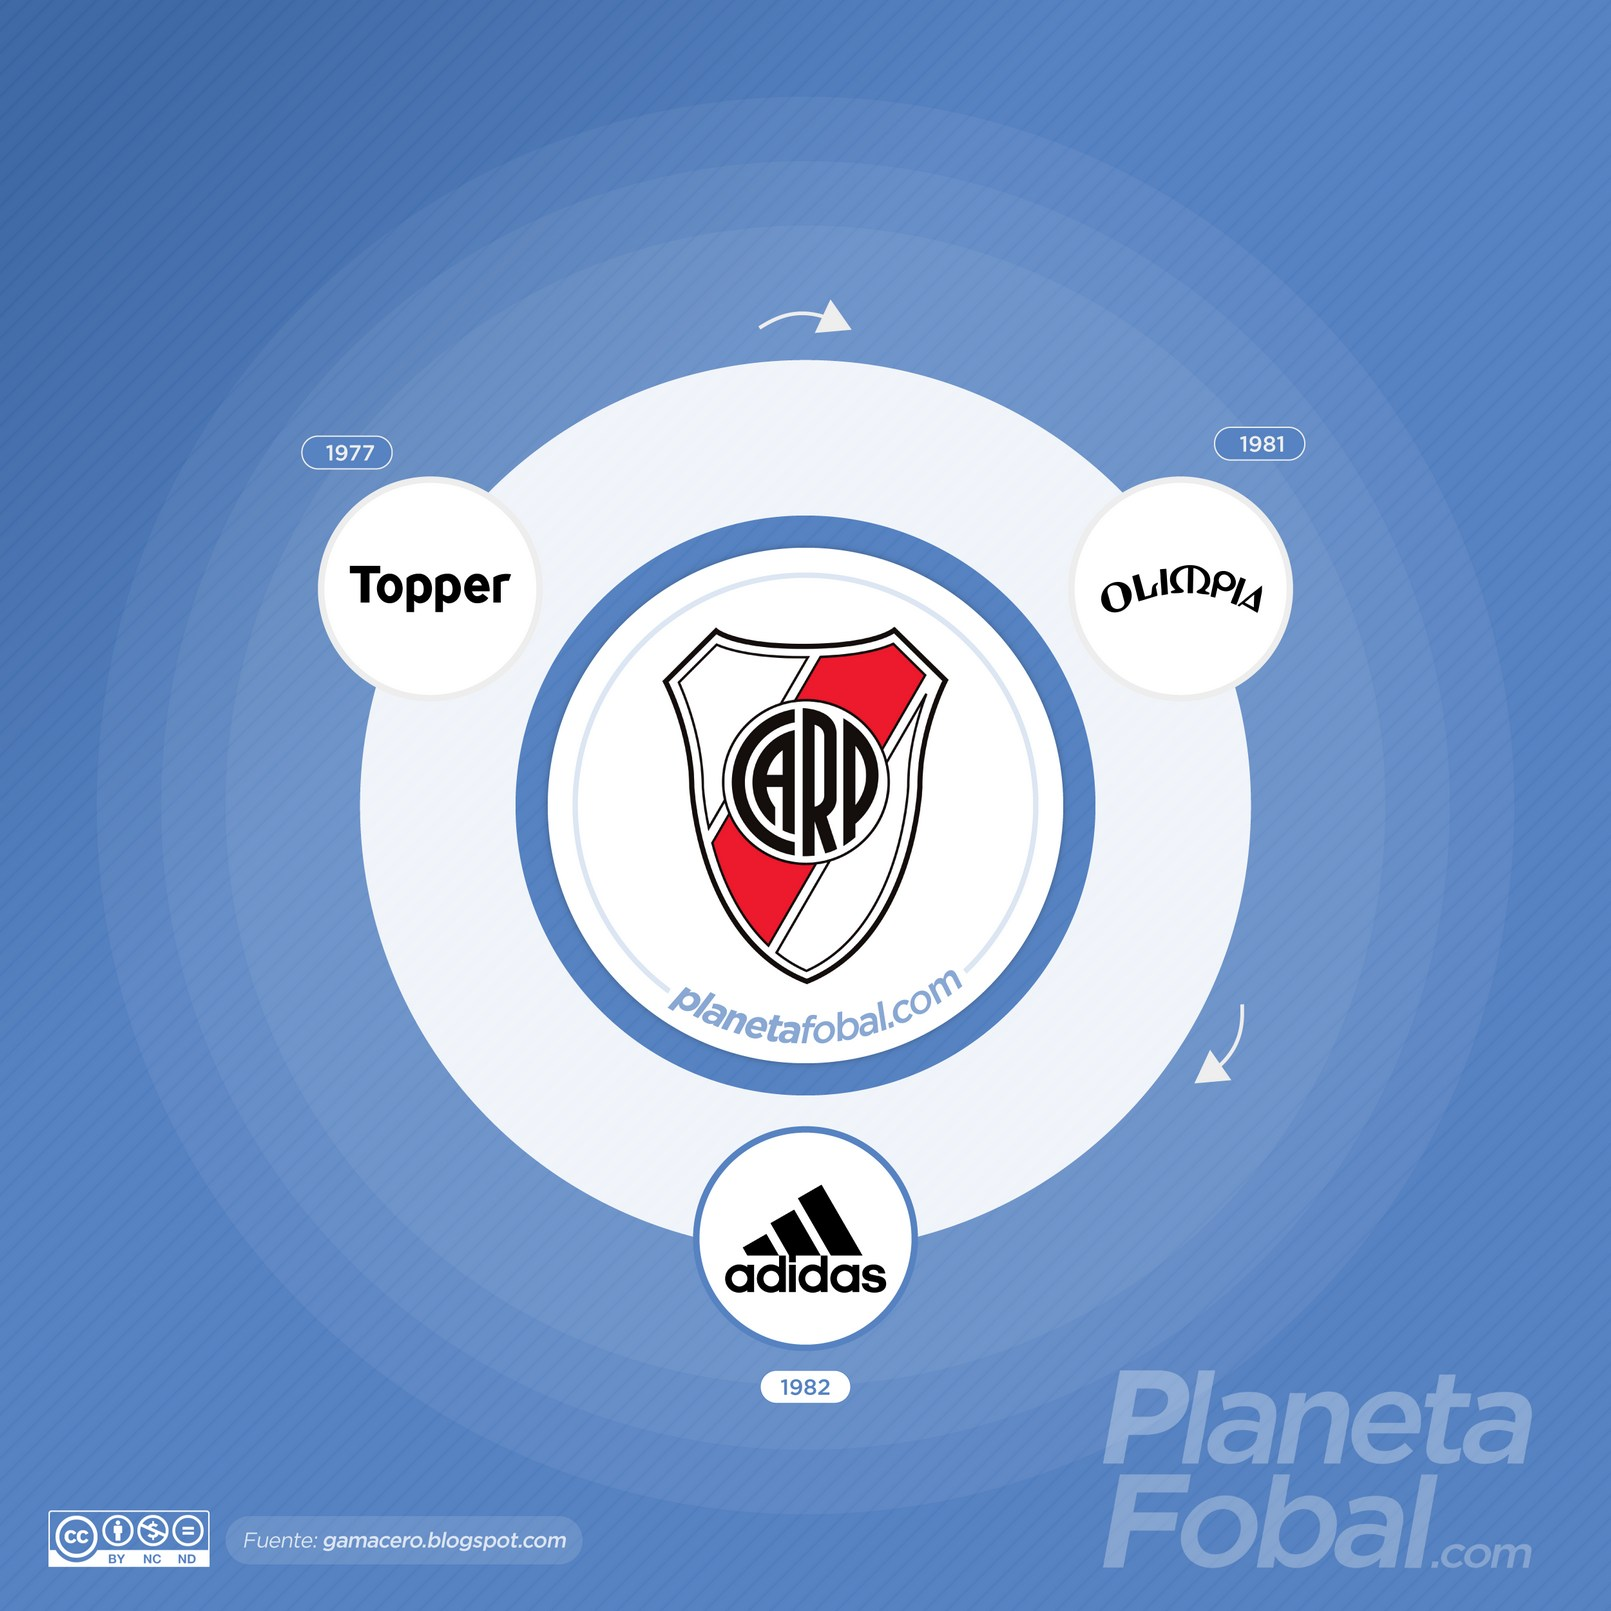 Marcas deportivas que vistieron a River Plate de Argentina